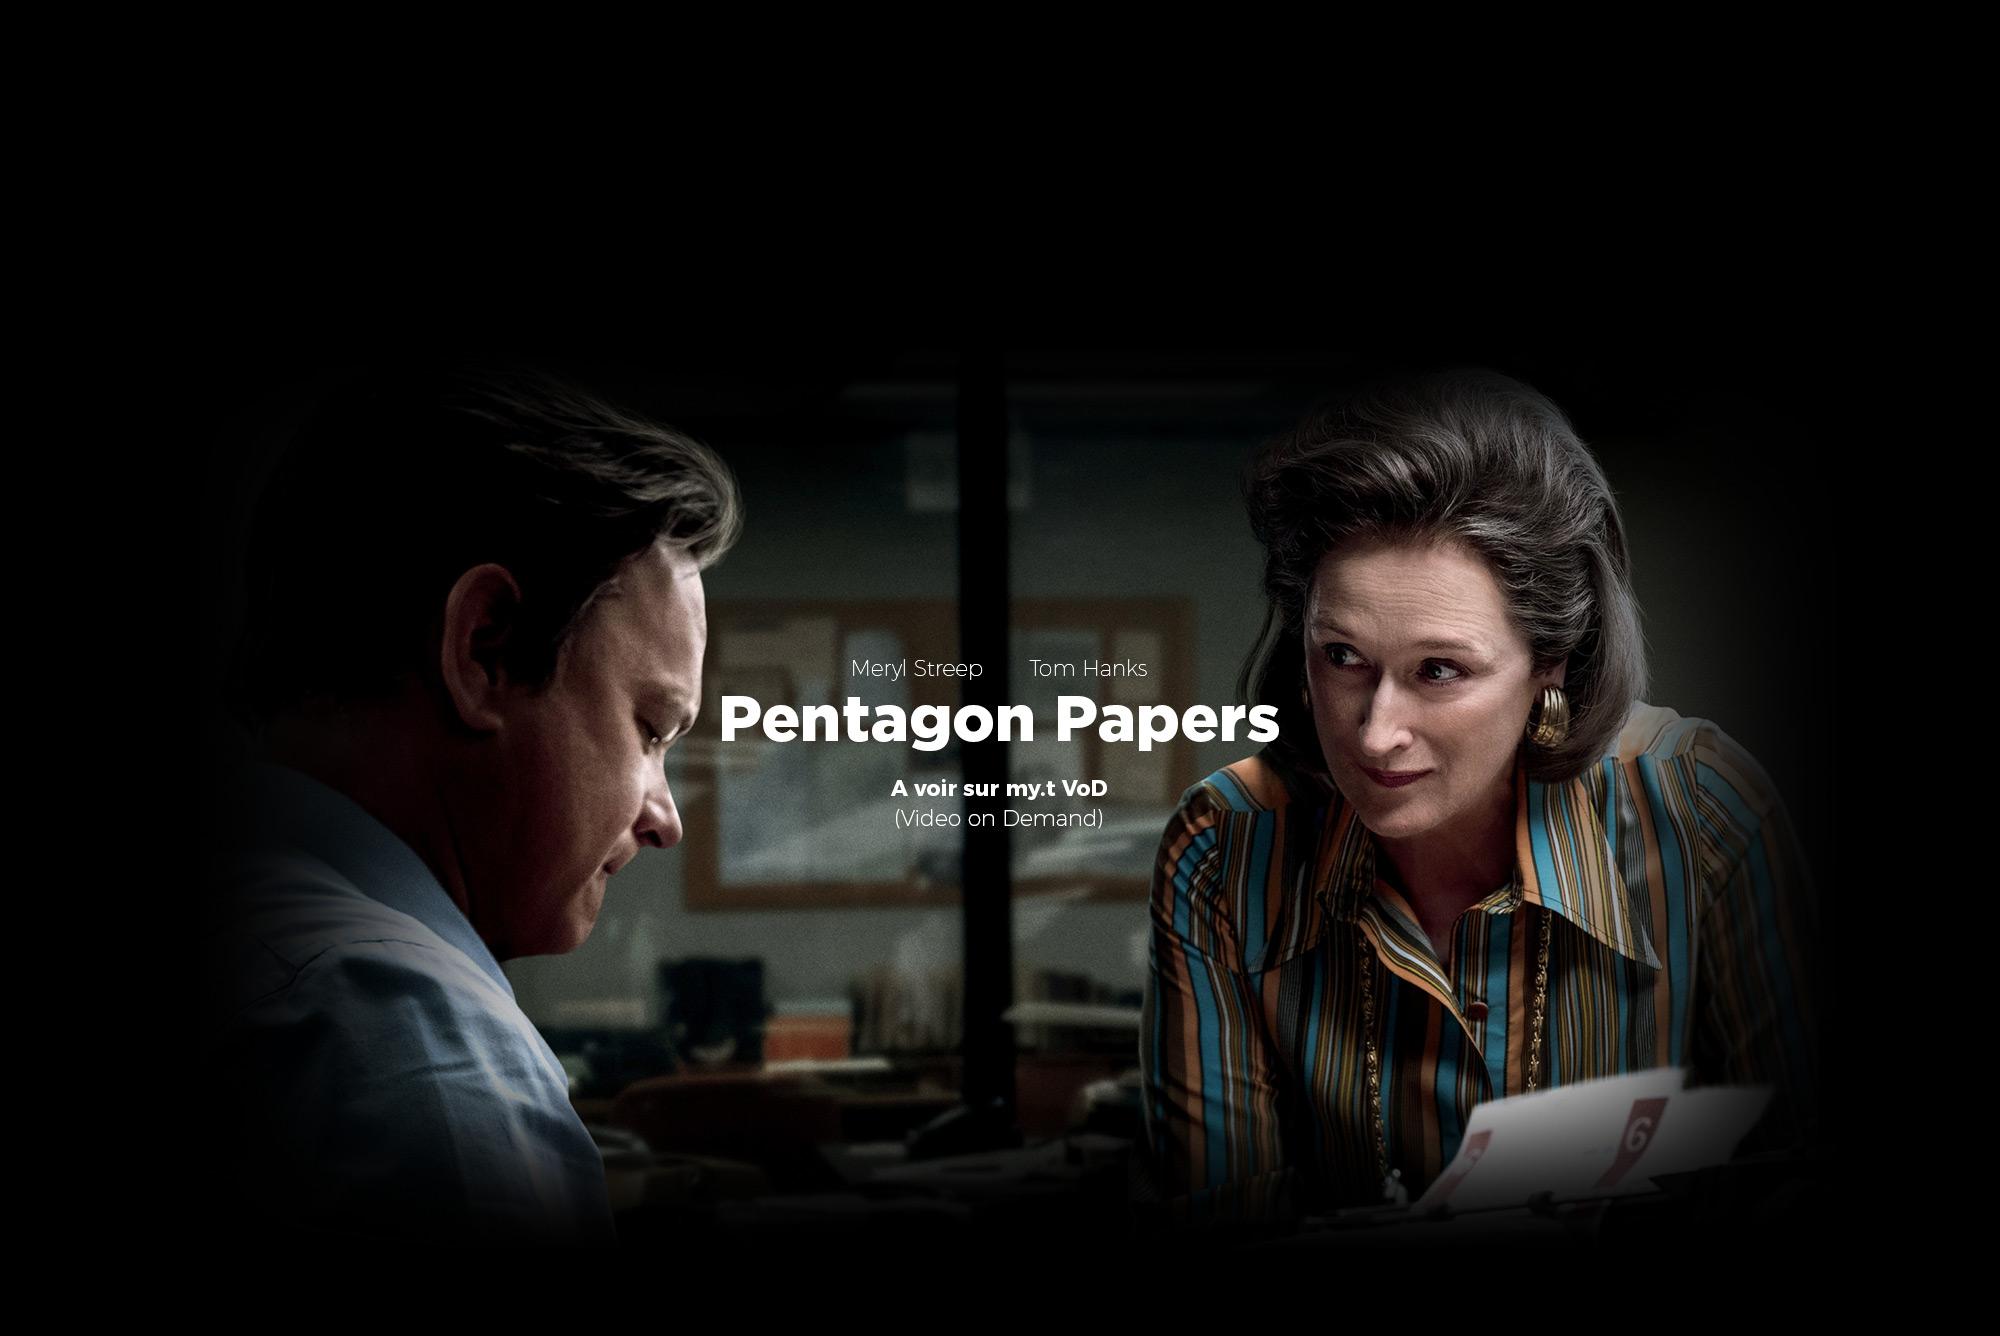 pentagon my.t vod